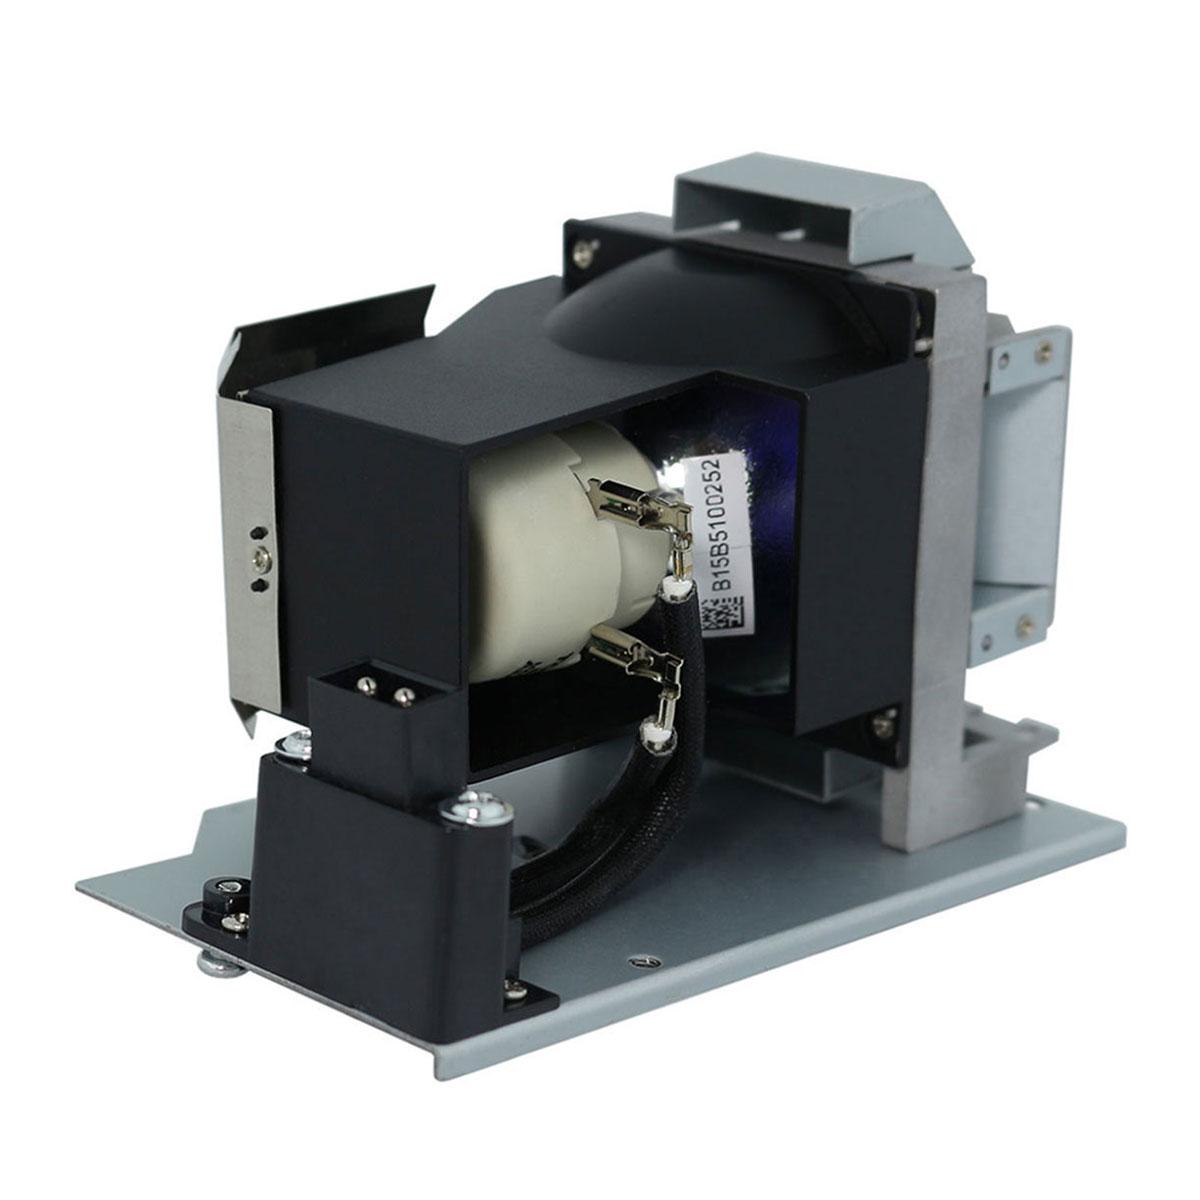 Lutema Platinum for BenQ W1060 Projector Lamp (Original Philips Bulb) - image 3 of 5